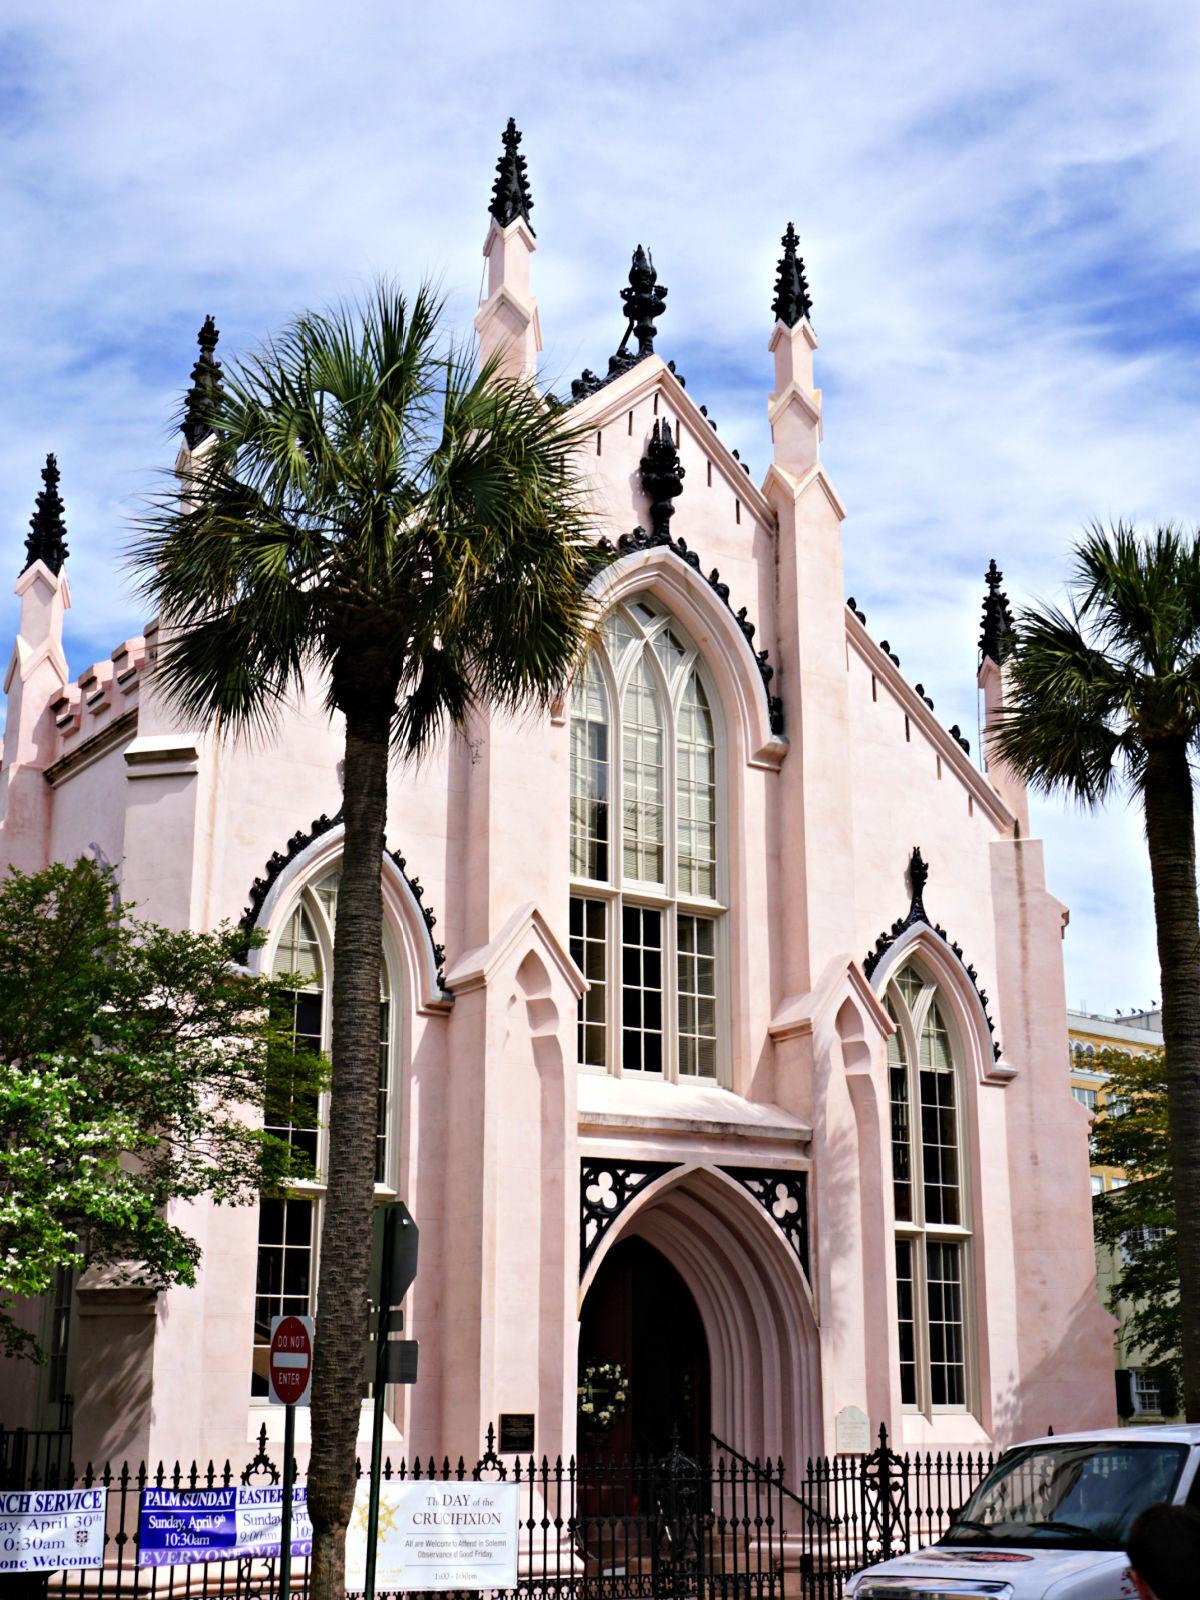 Pink French Huguenot church.